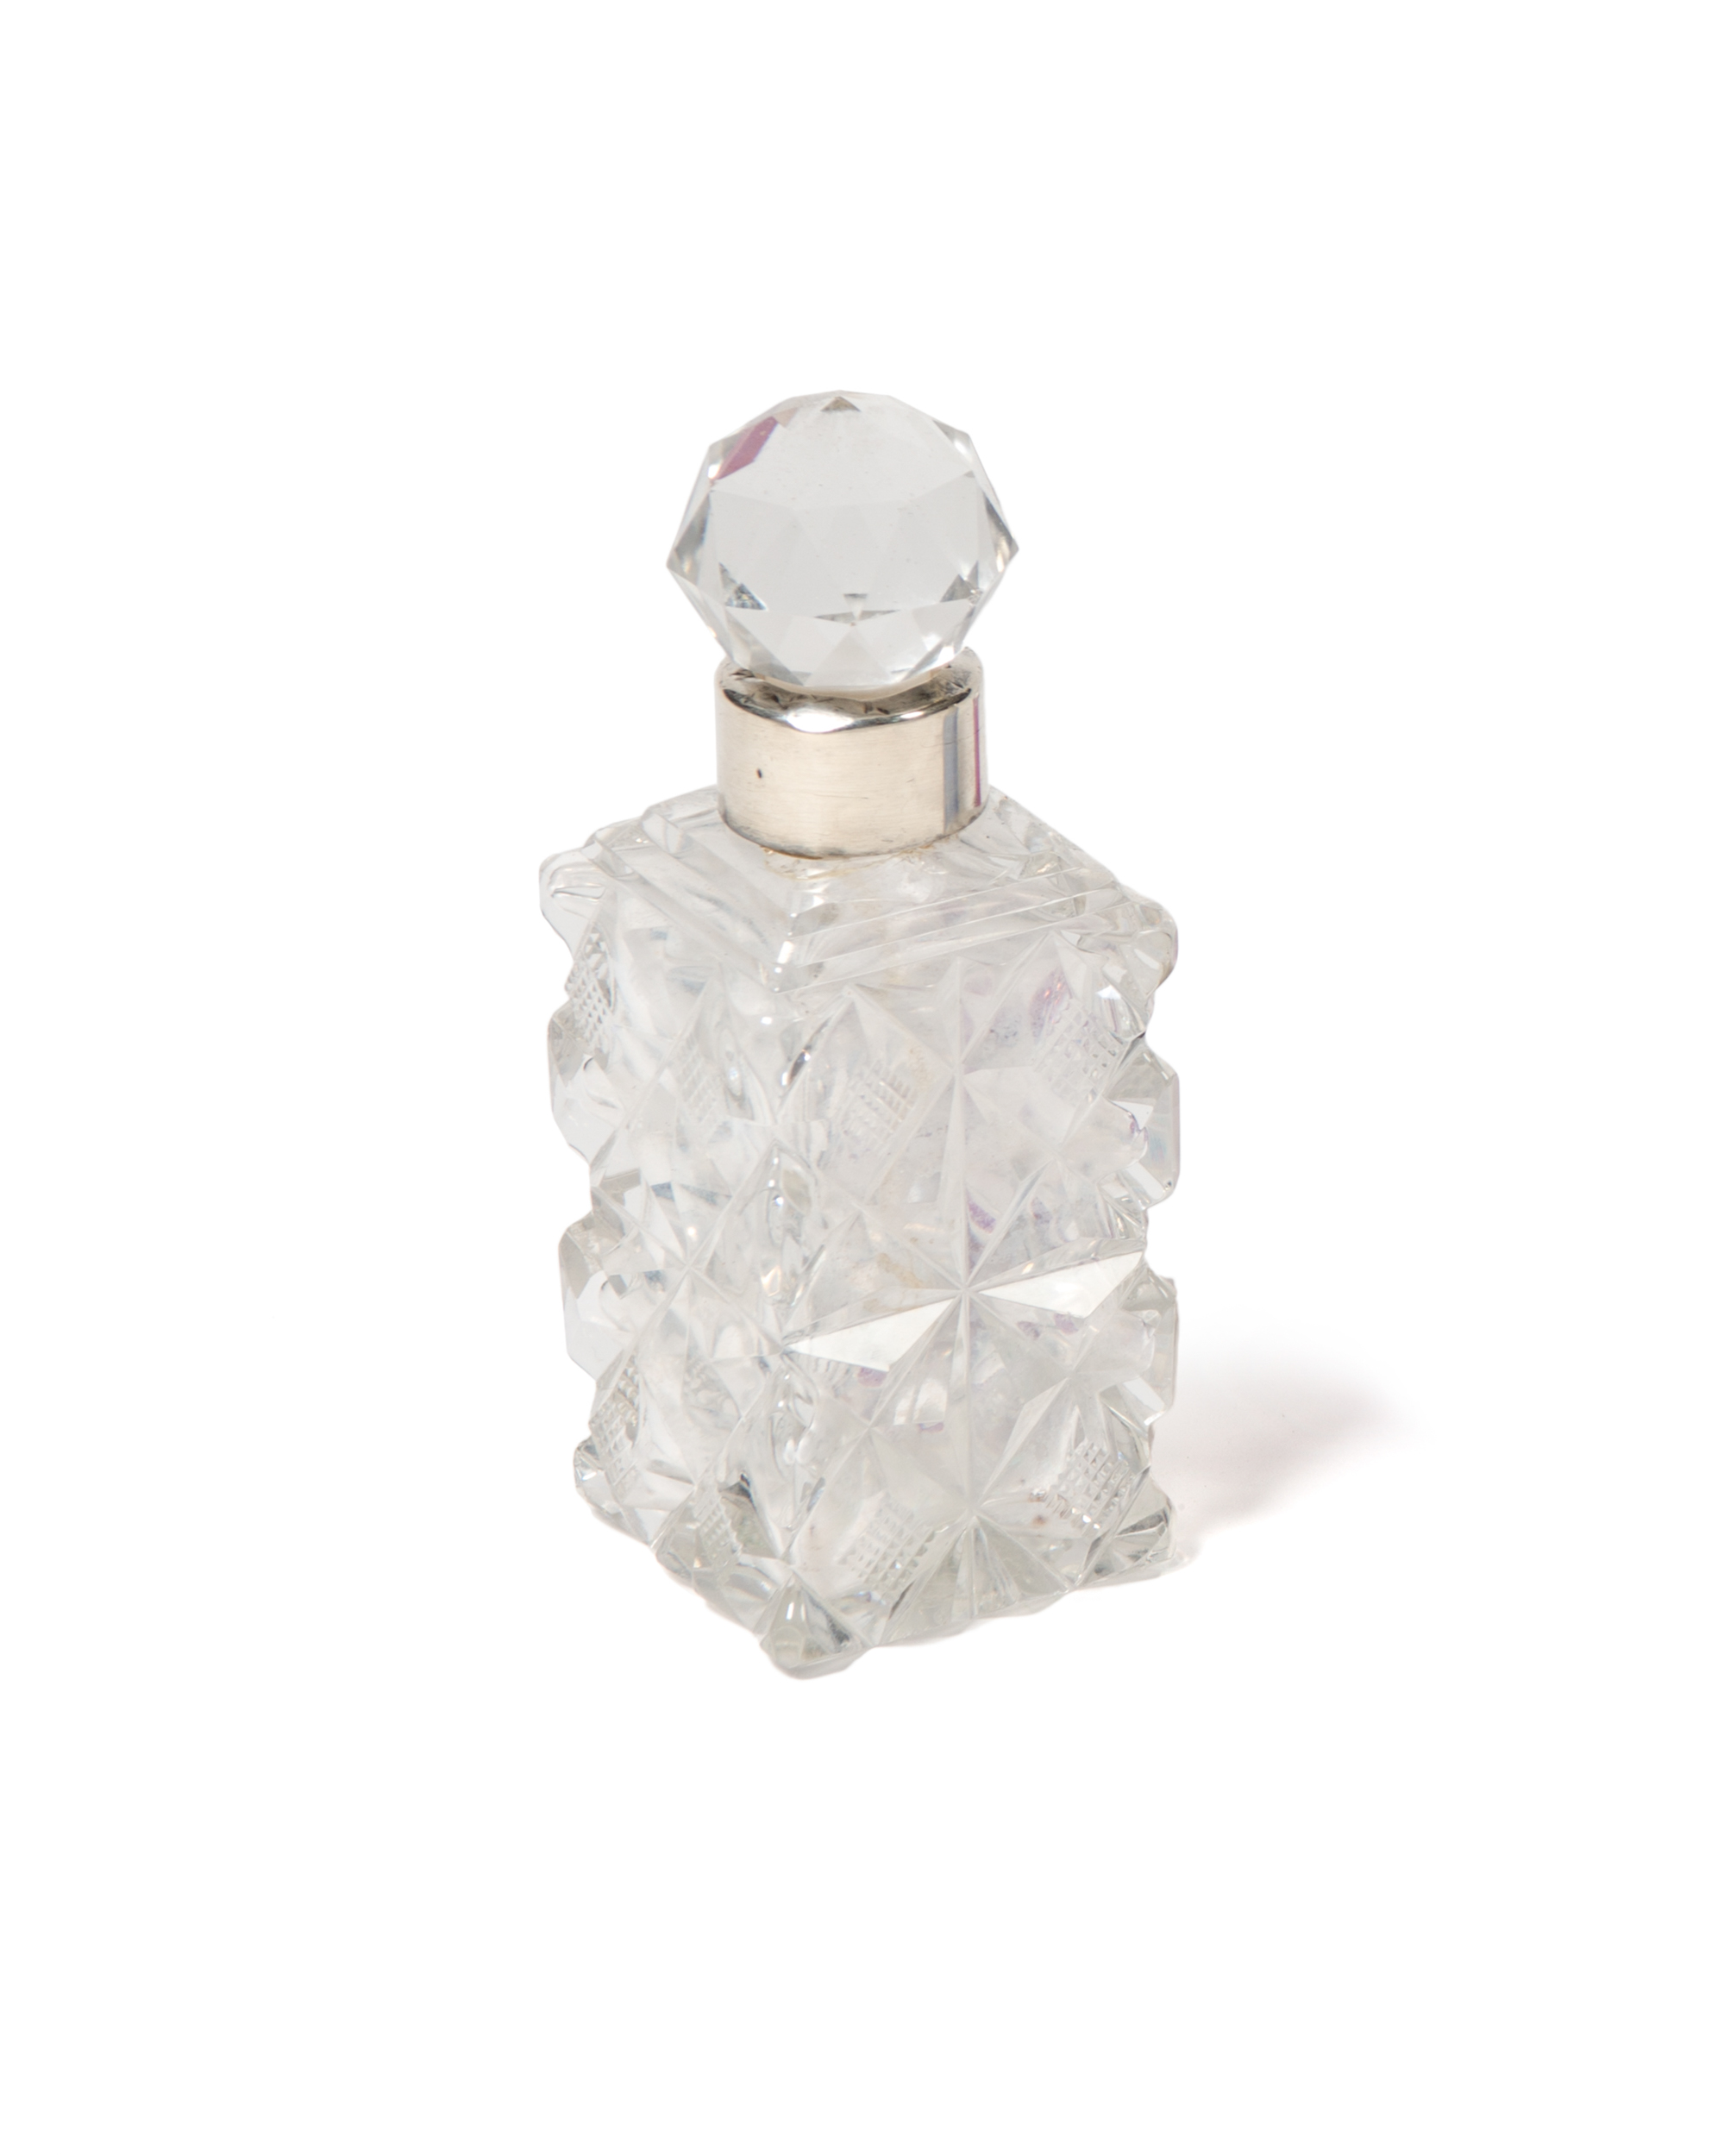 cut_crystal_perfume_bottle_137i